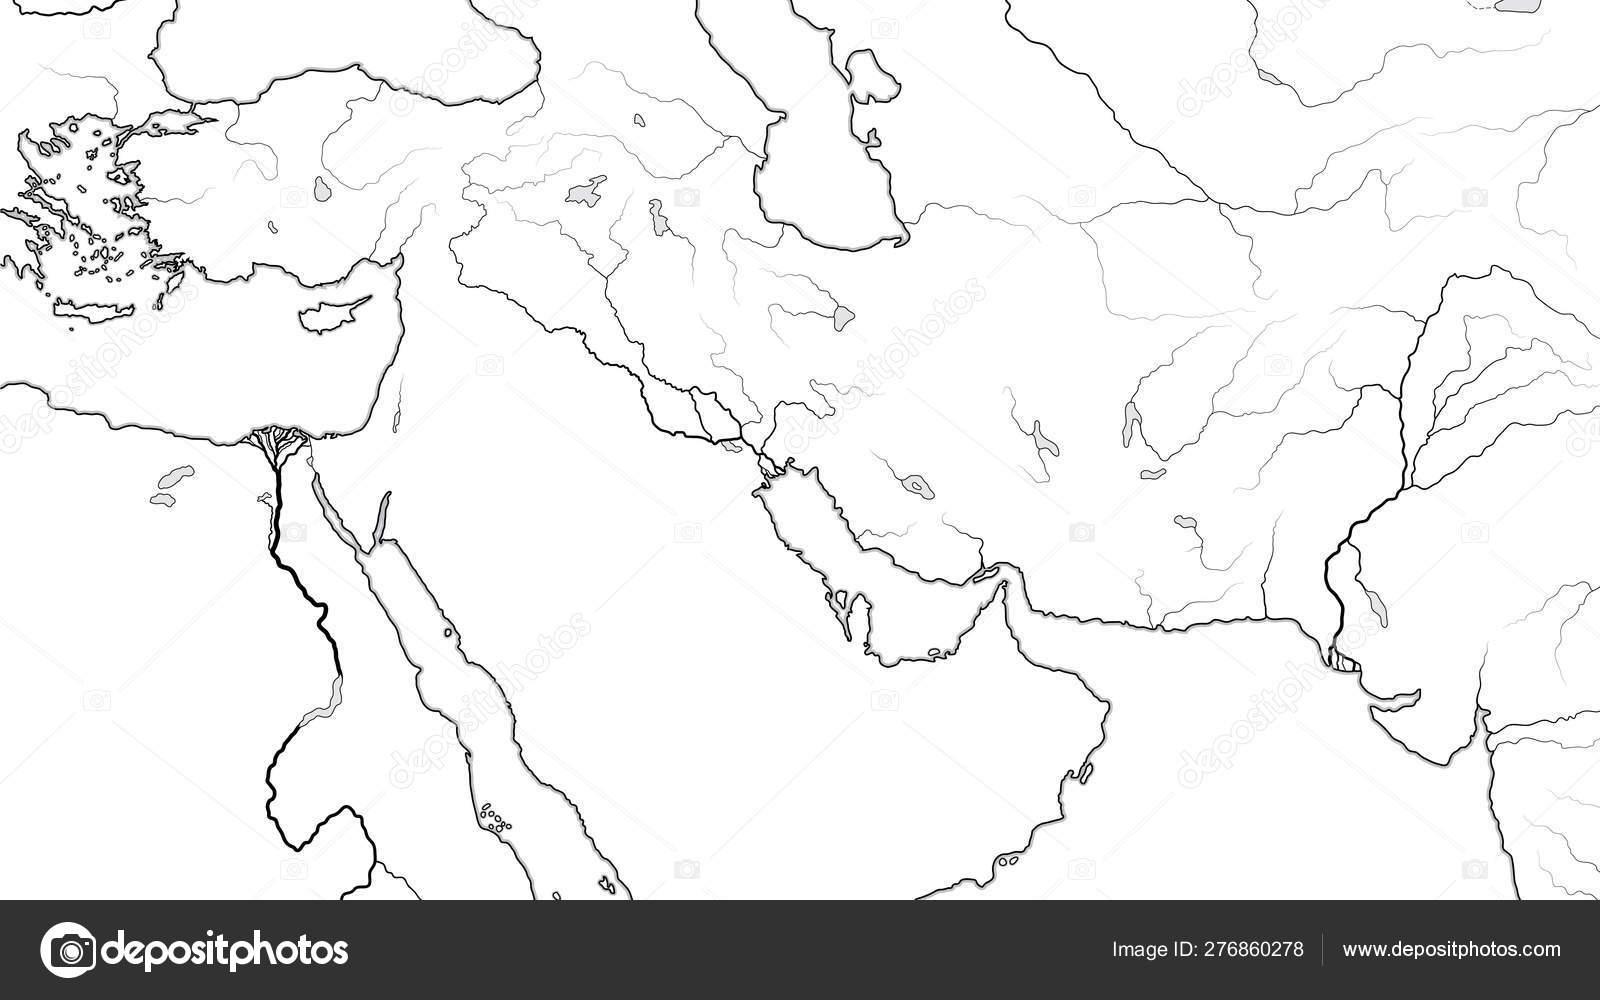 Image of: World Map Of Middle East Region Asia Minor Near East Levant Turkey Armenia Syria Iraq The Emirates Saudi Arabia Persian Gulf Iran Pakistan Geographic Chart With Coastline And Main Rivers Stock